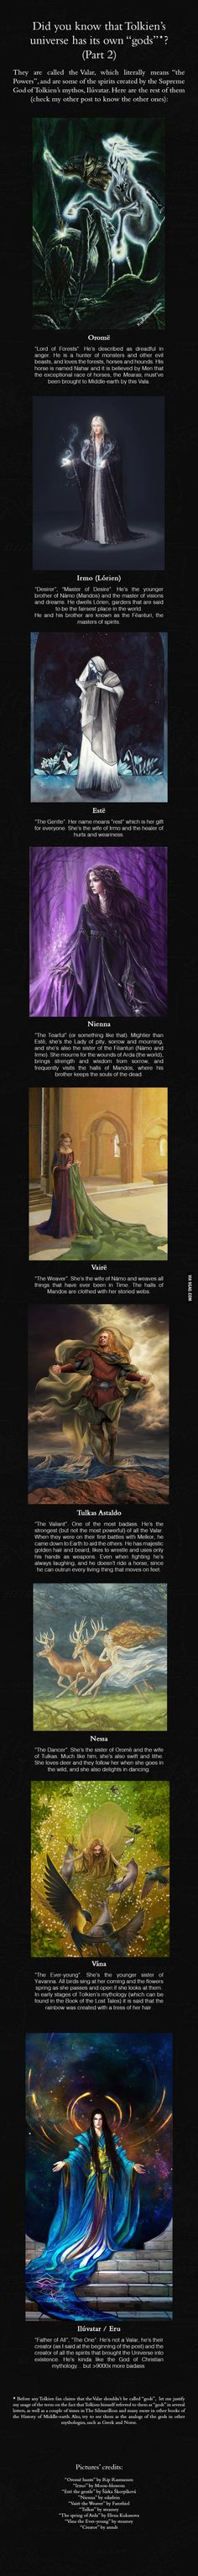 The Valar, part 2 - J.R.R. Tolkien's Mythology - 9GAG